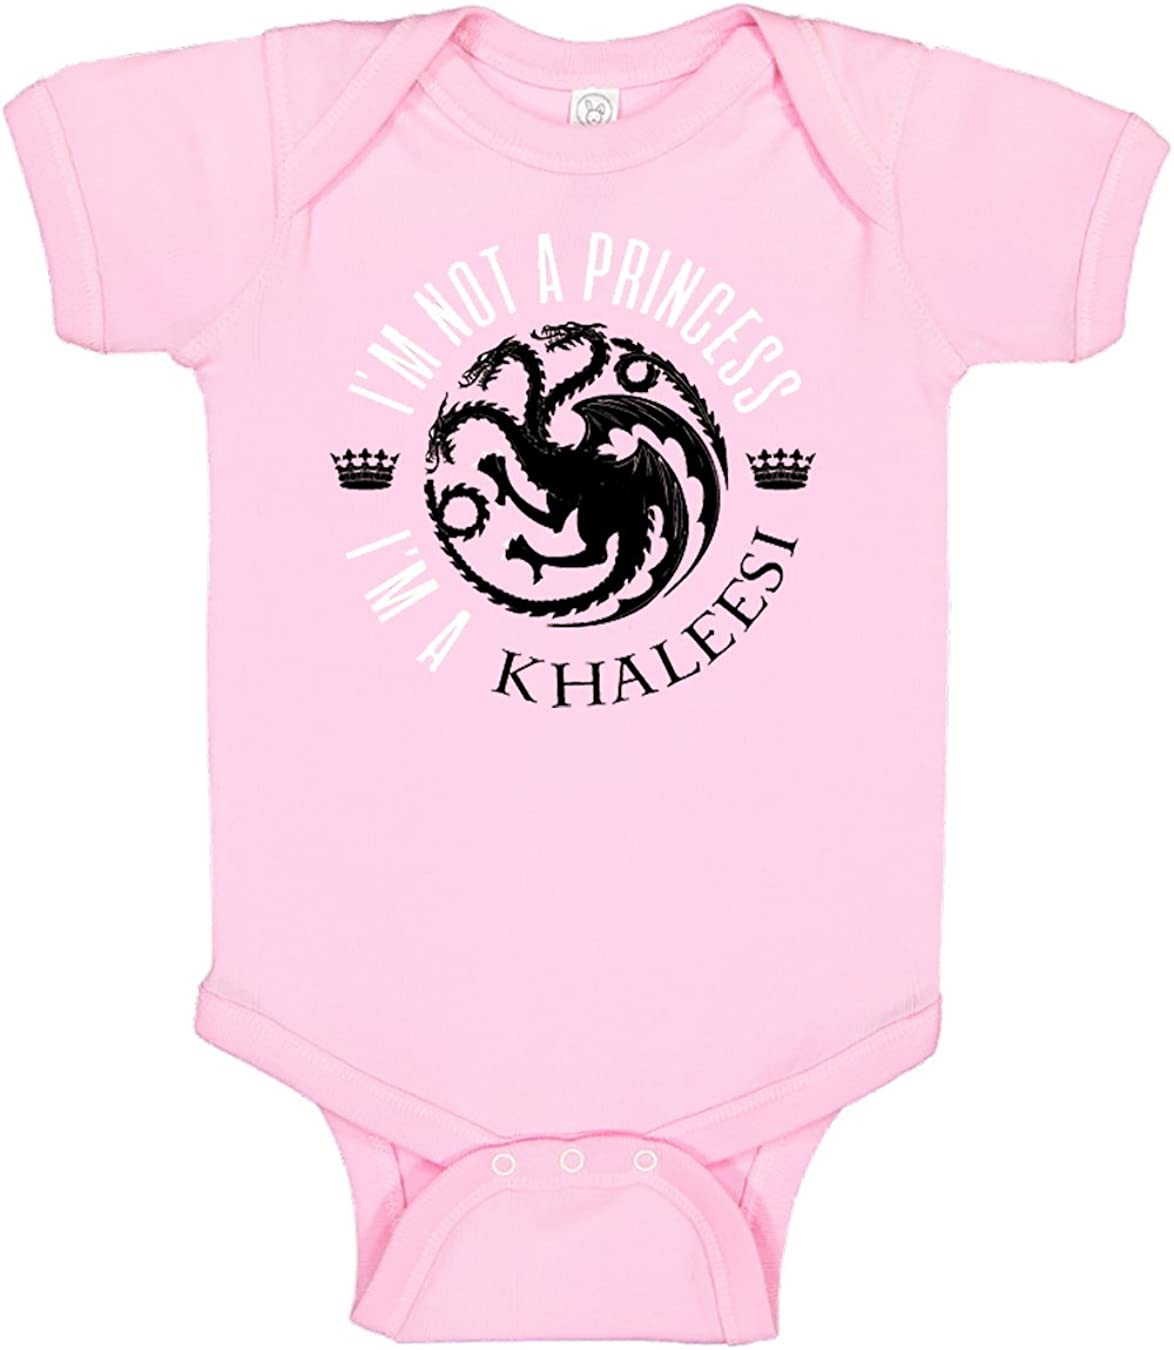 Panoware Funny Baby Girl Onesie   I'm Not a Princess I'm a Khaleesi